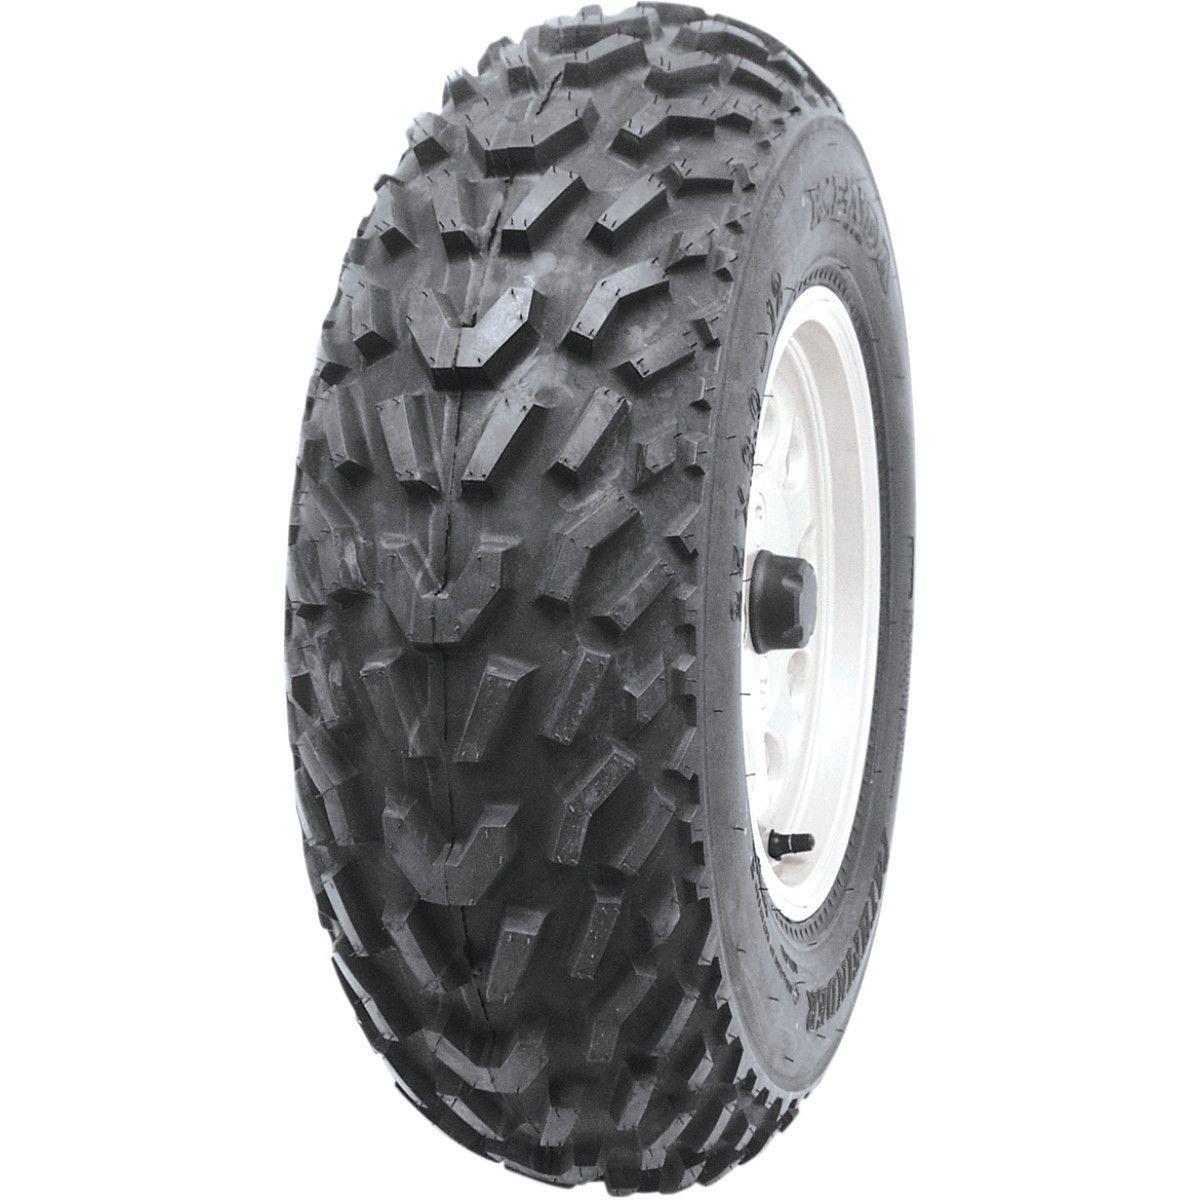 23X8-11 Kenda Pathfinder K530 ATV Tire